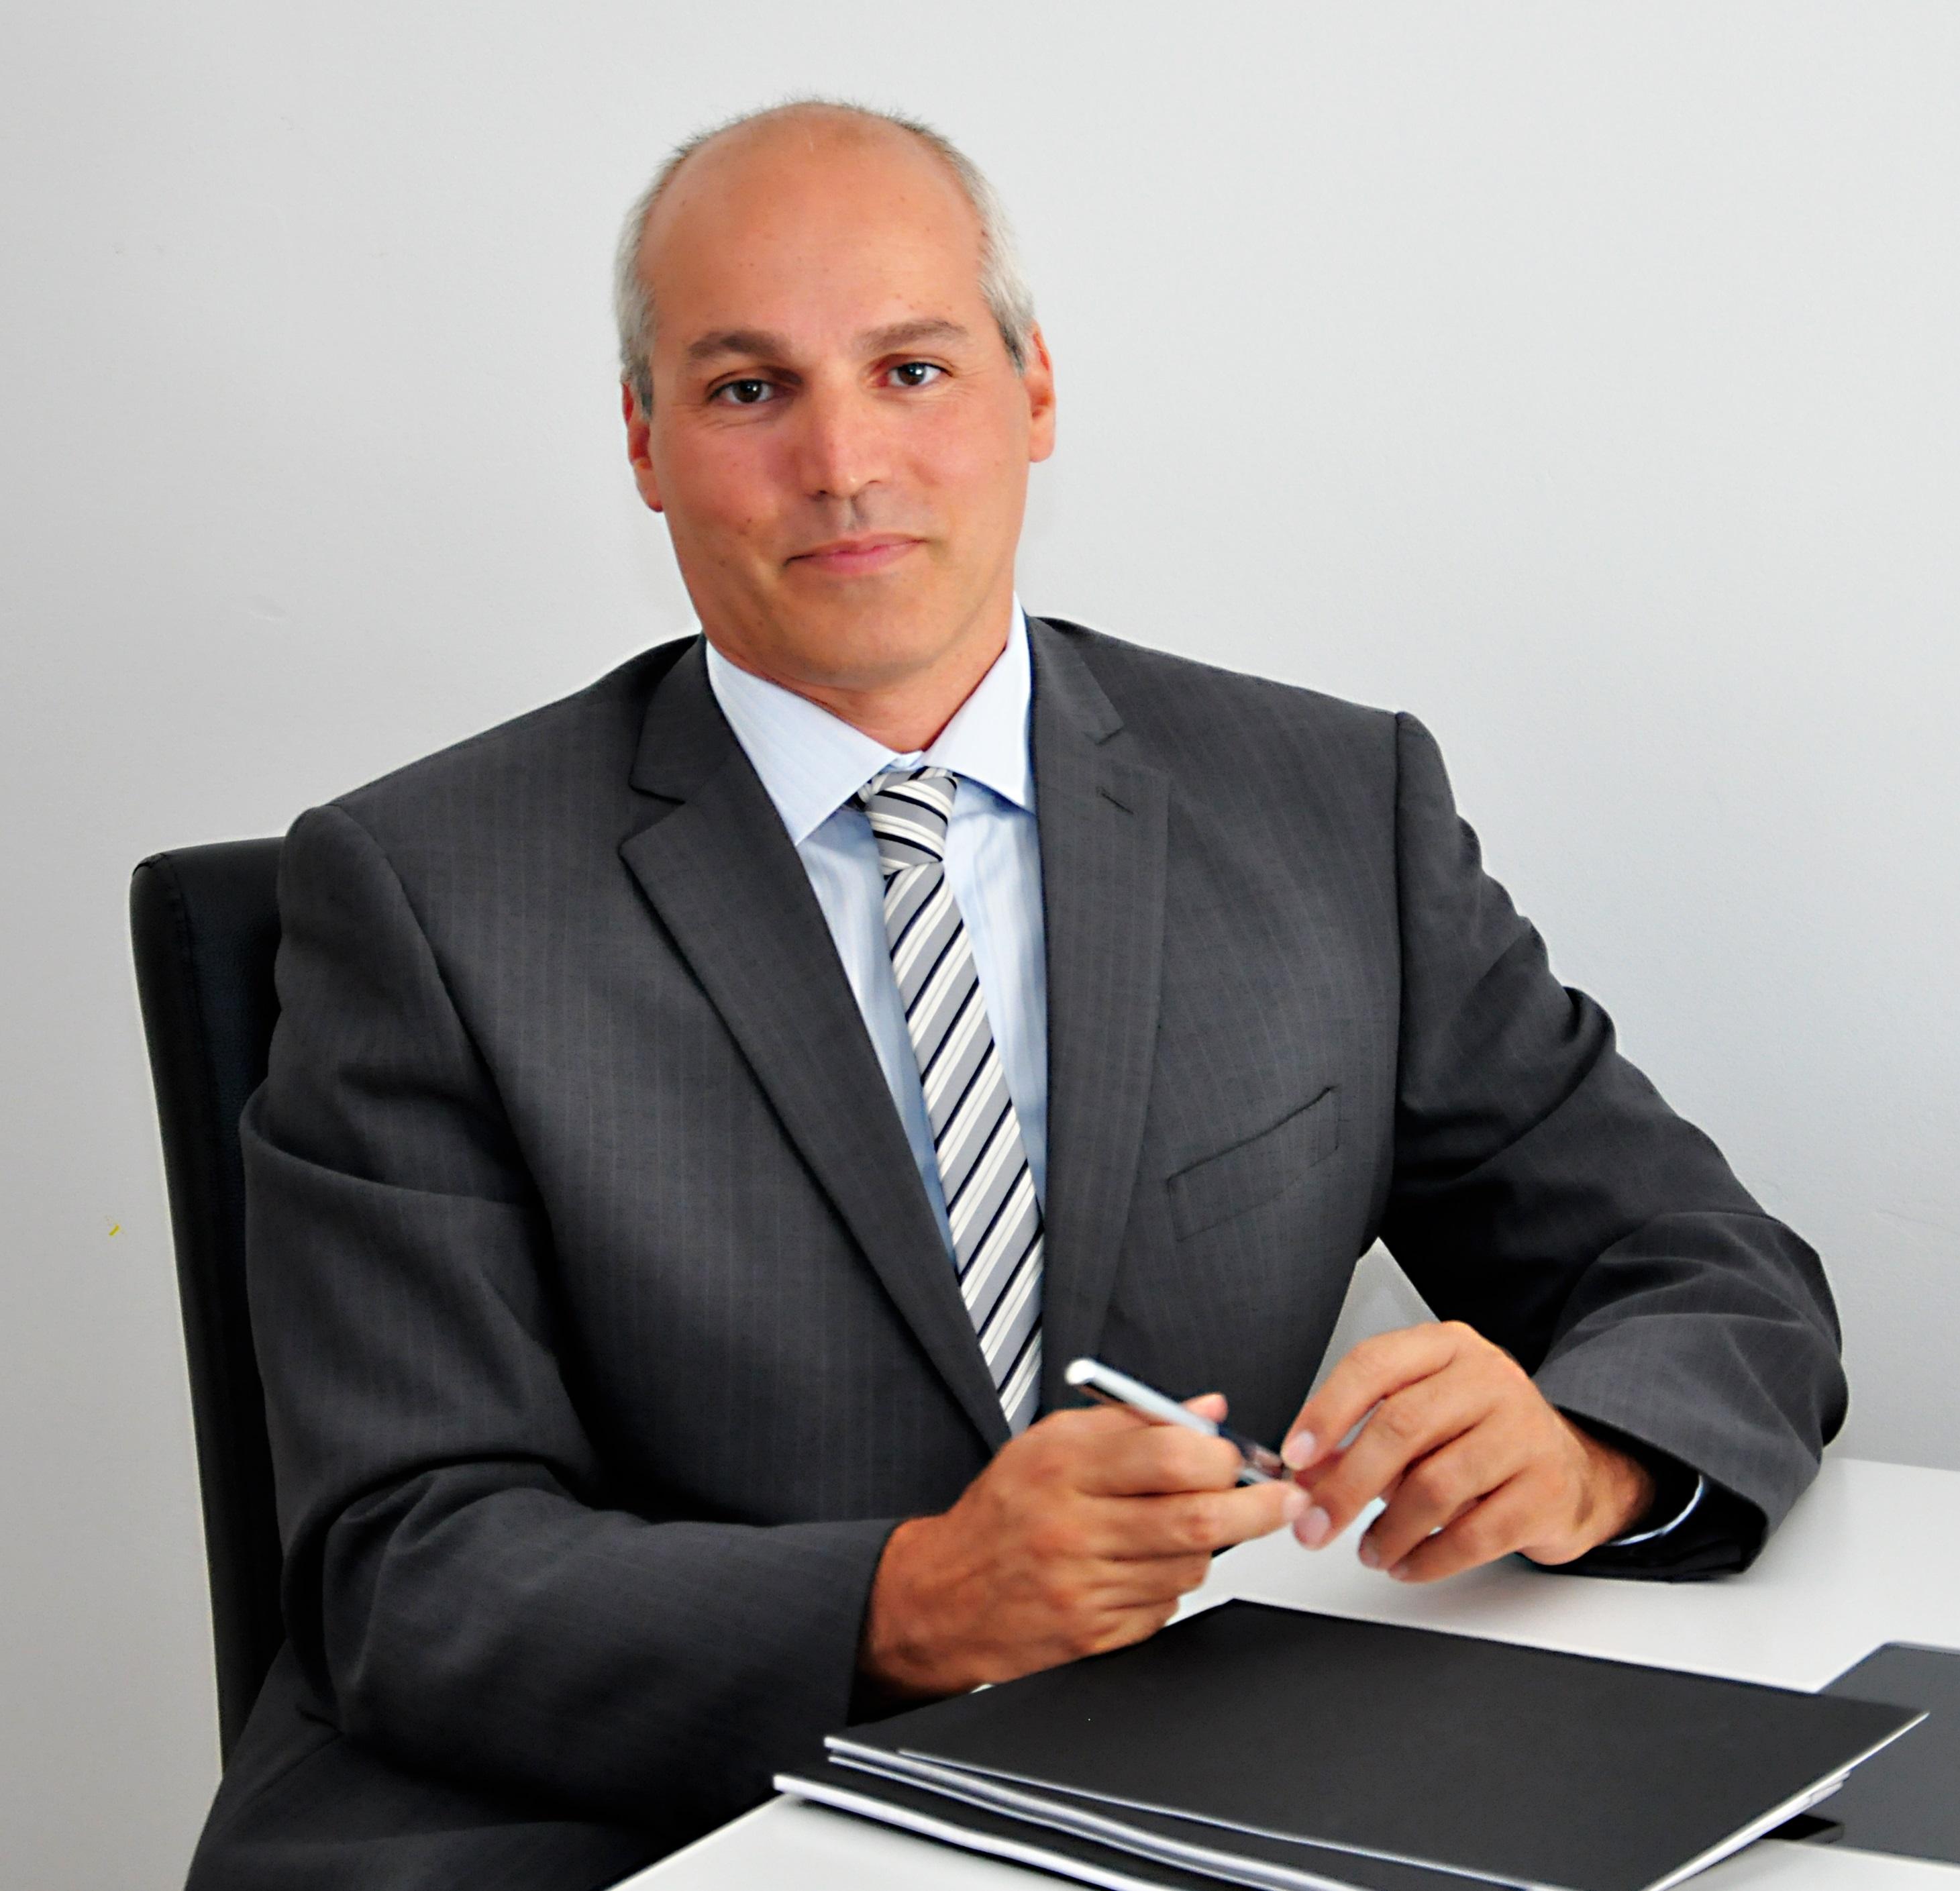 Ignacio Pedrosa